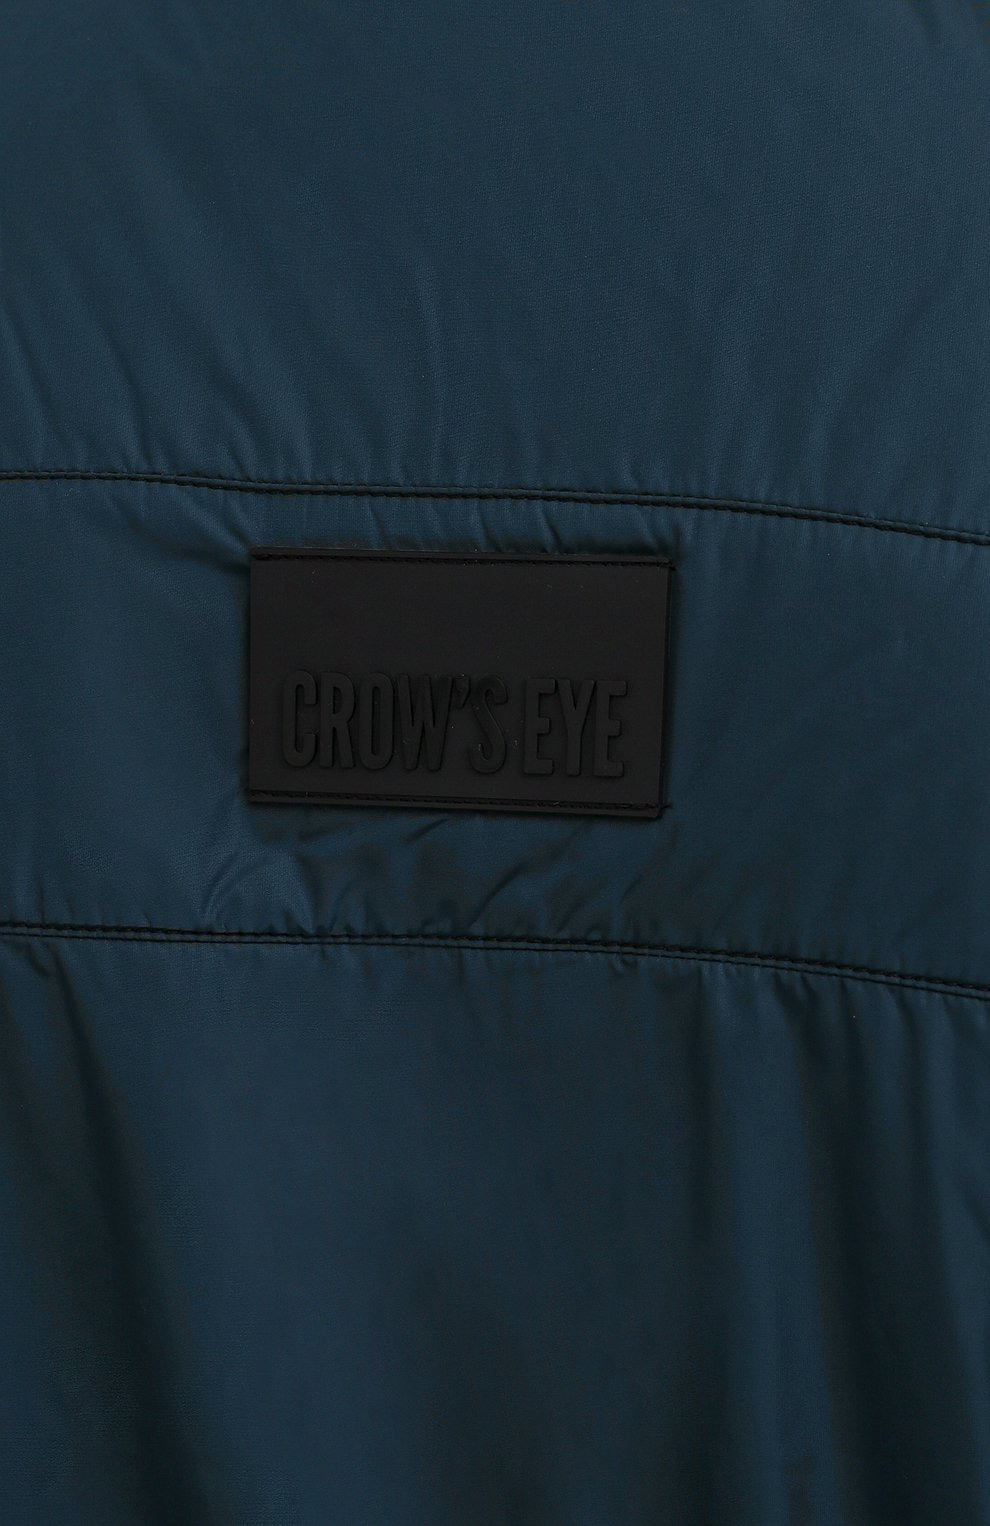 Мужской жилет CROW'S EYE темно-бирюзового цвета, арт. LE 65   Фото 5 (Кросс-КТ: Куртка; Материал внешний: Синтетический материал; Стили: Спорт-шик; Материал подклада: Синтетический материал; Мужское Кросс-КТ: Верхняя одежда; Длина (верхняя одежда): Короткие)